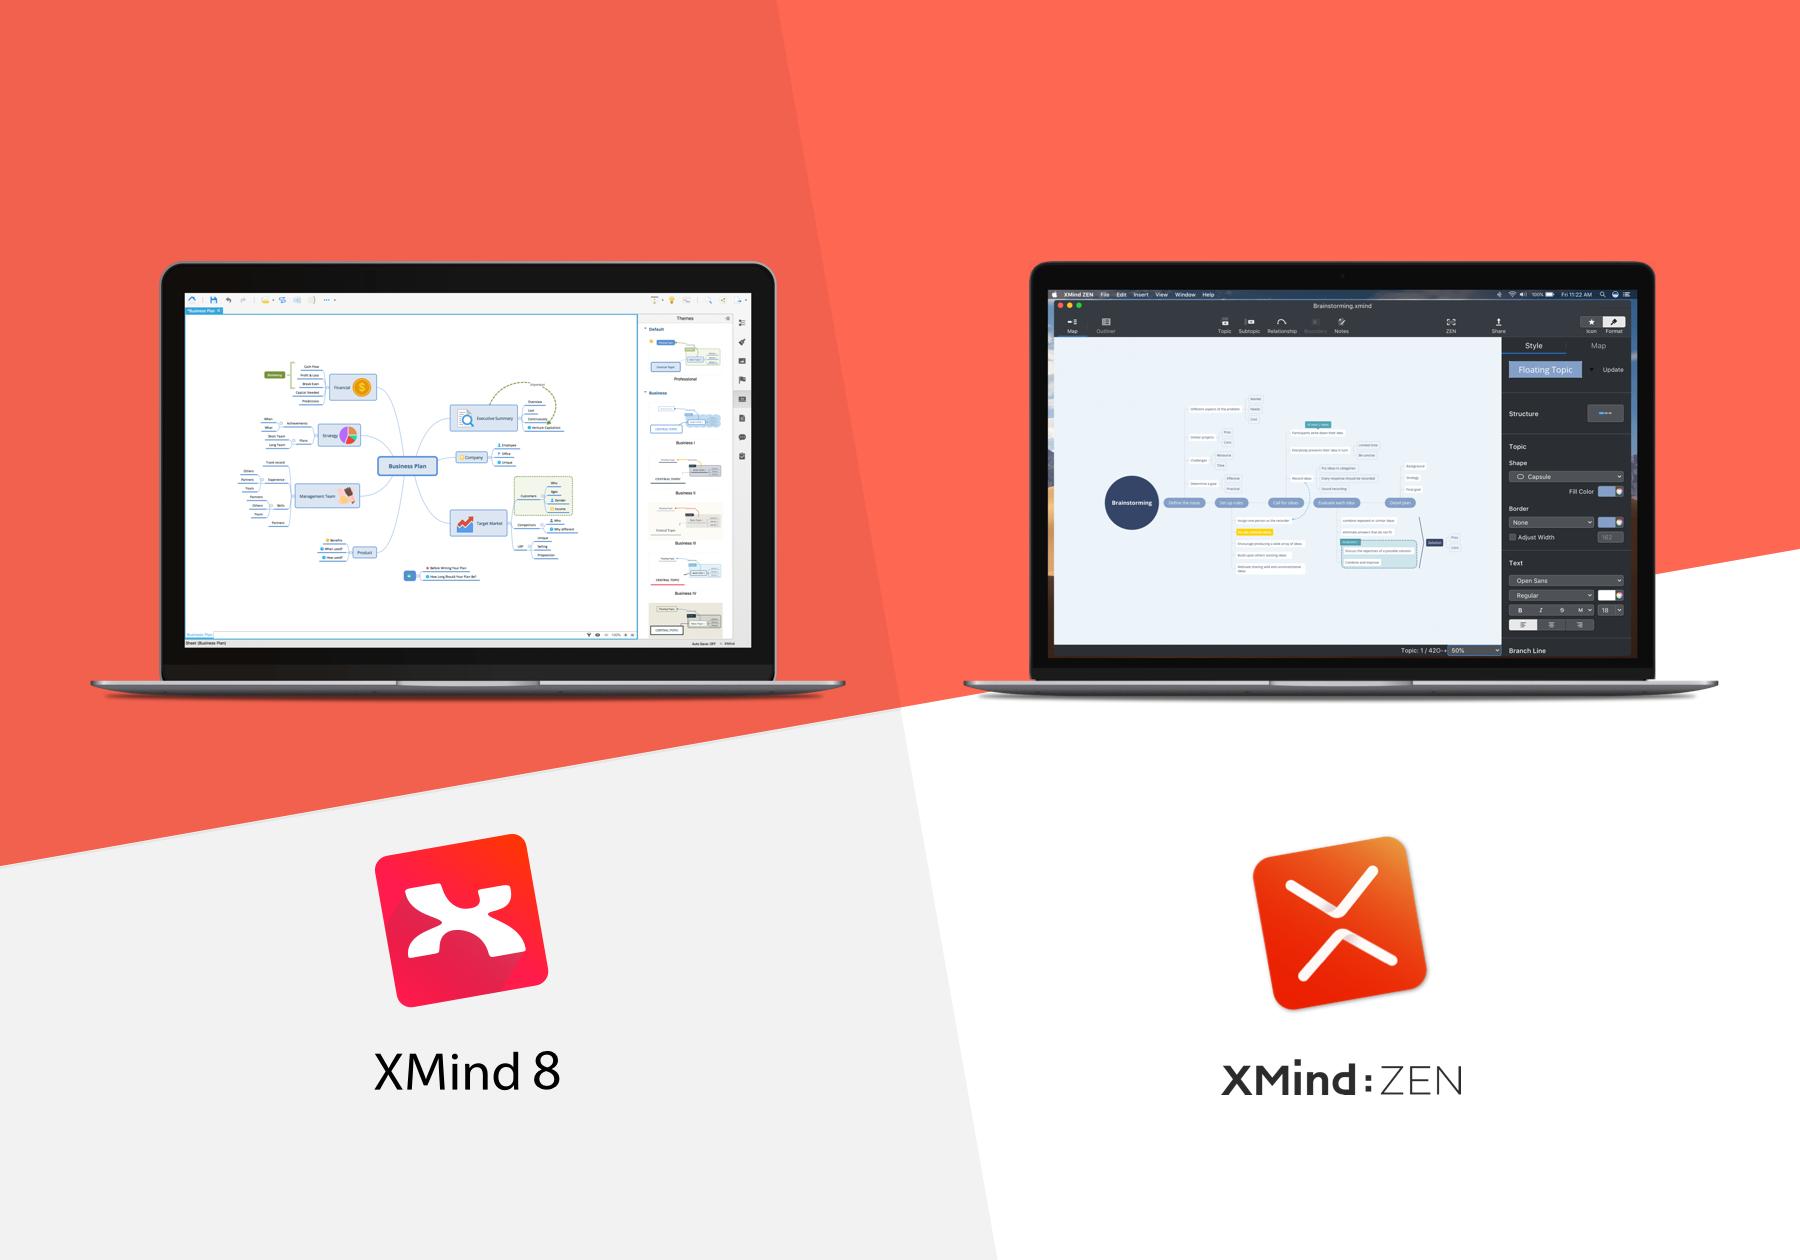 XMind Blog: Compare XMind: ZEN and XMind 8